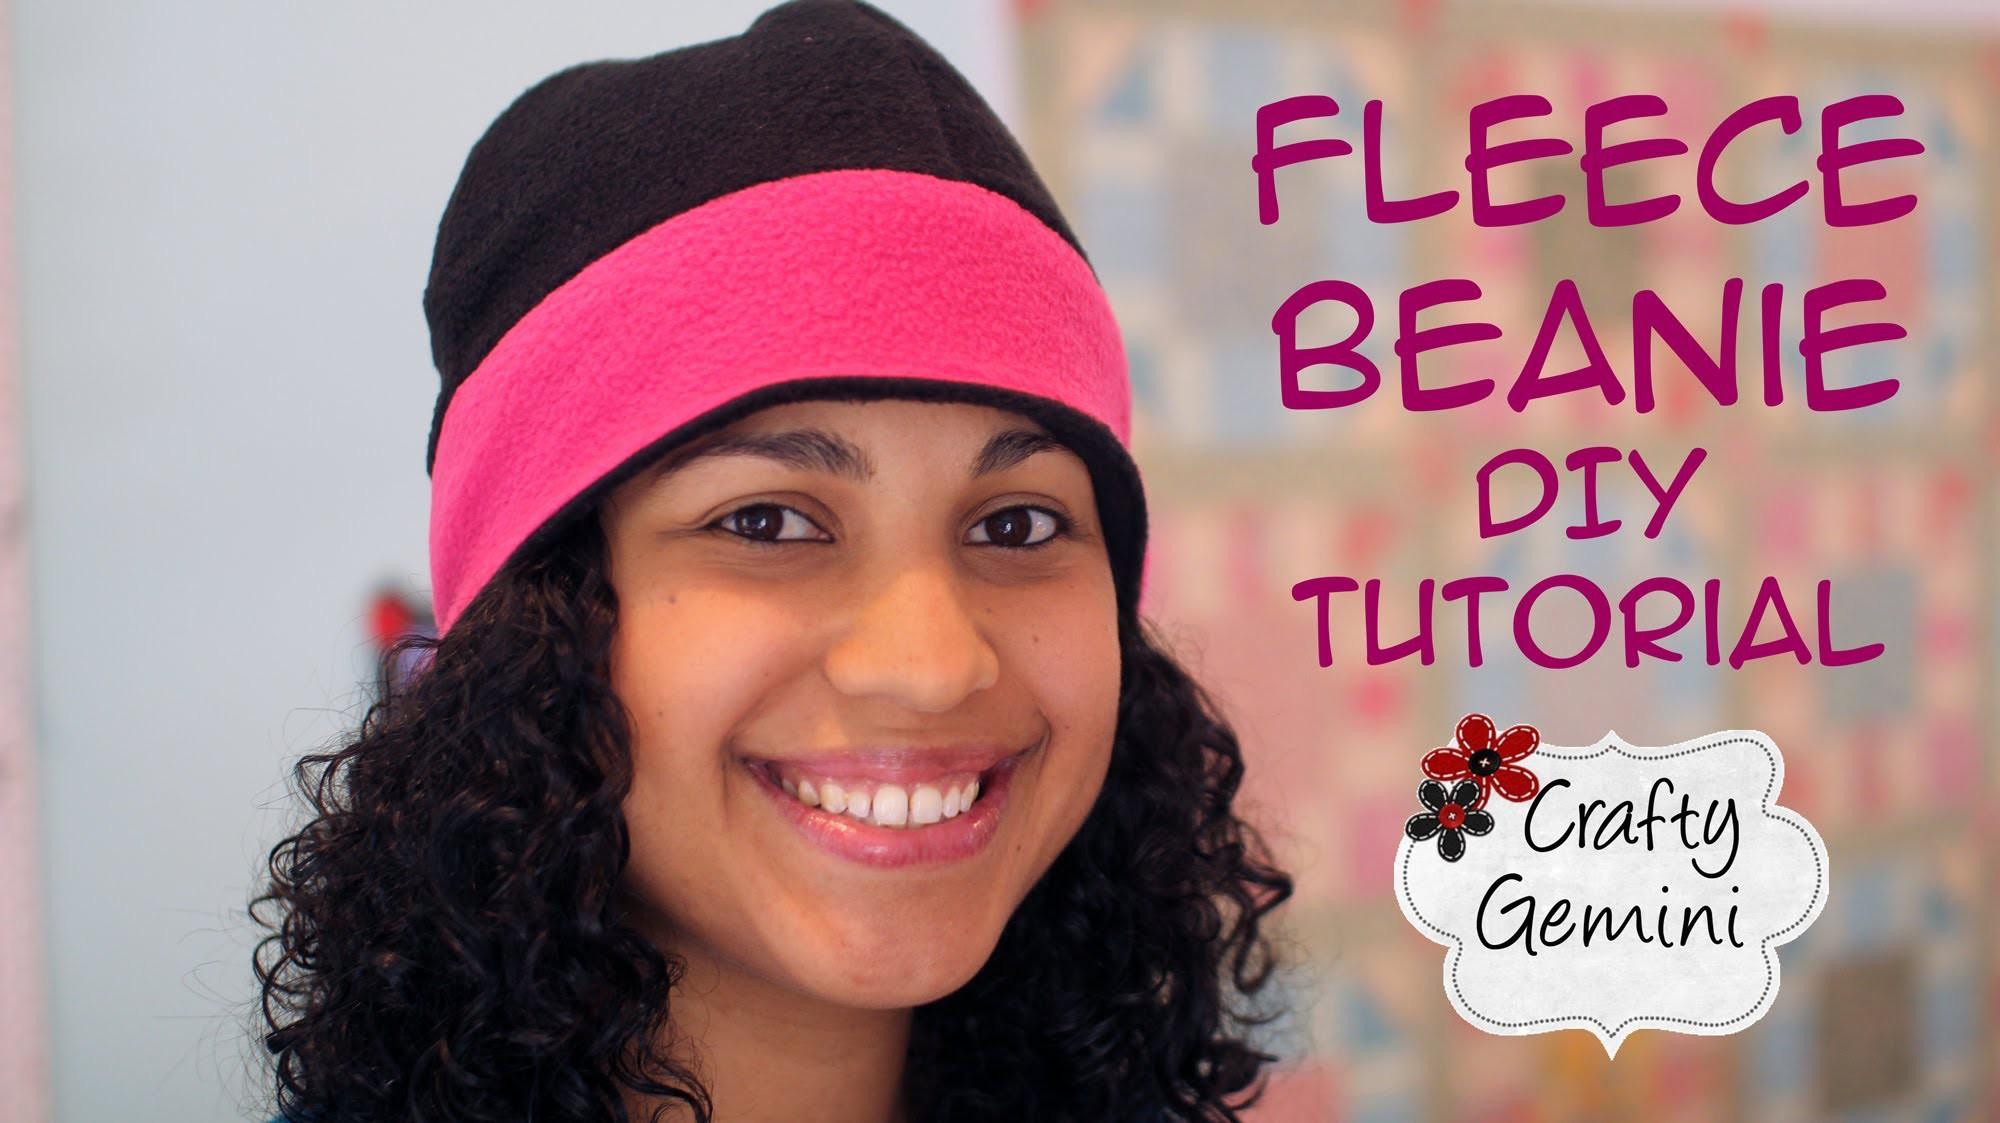 Fleece Beanie Hat- DIY Tutorial